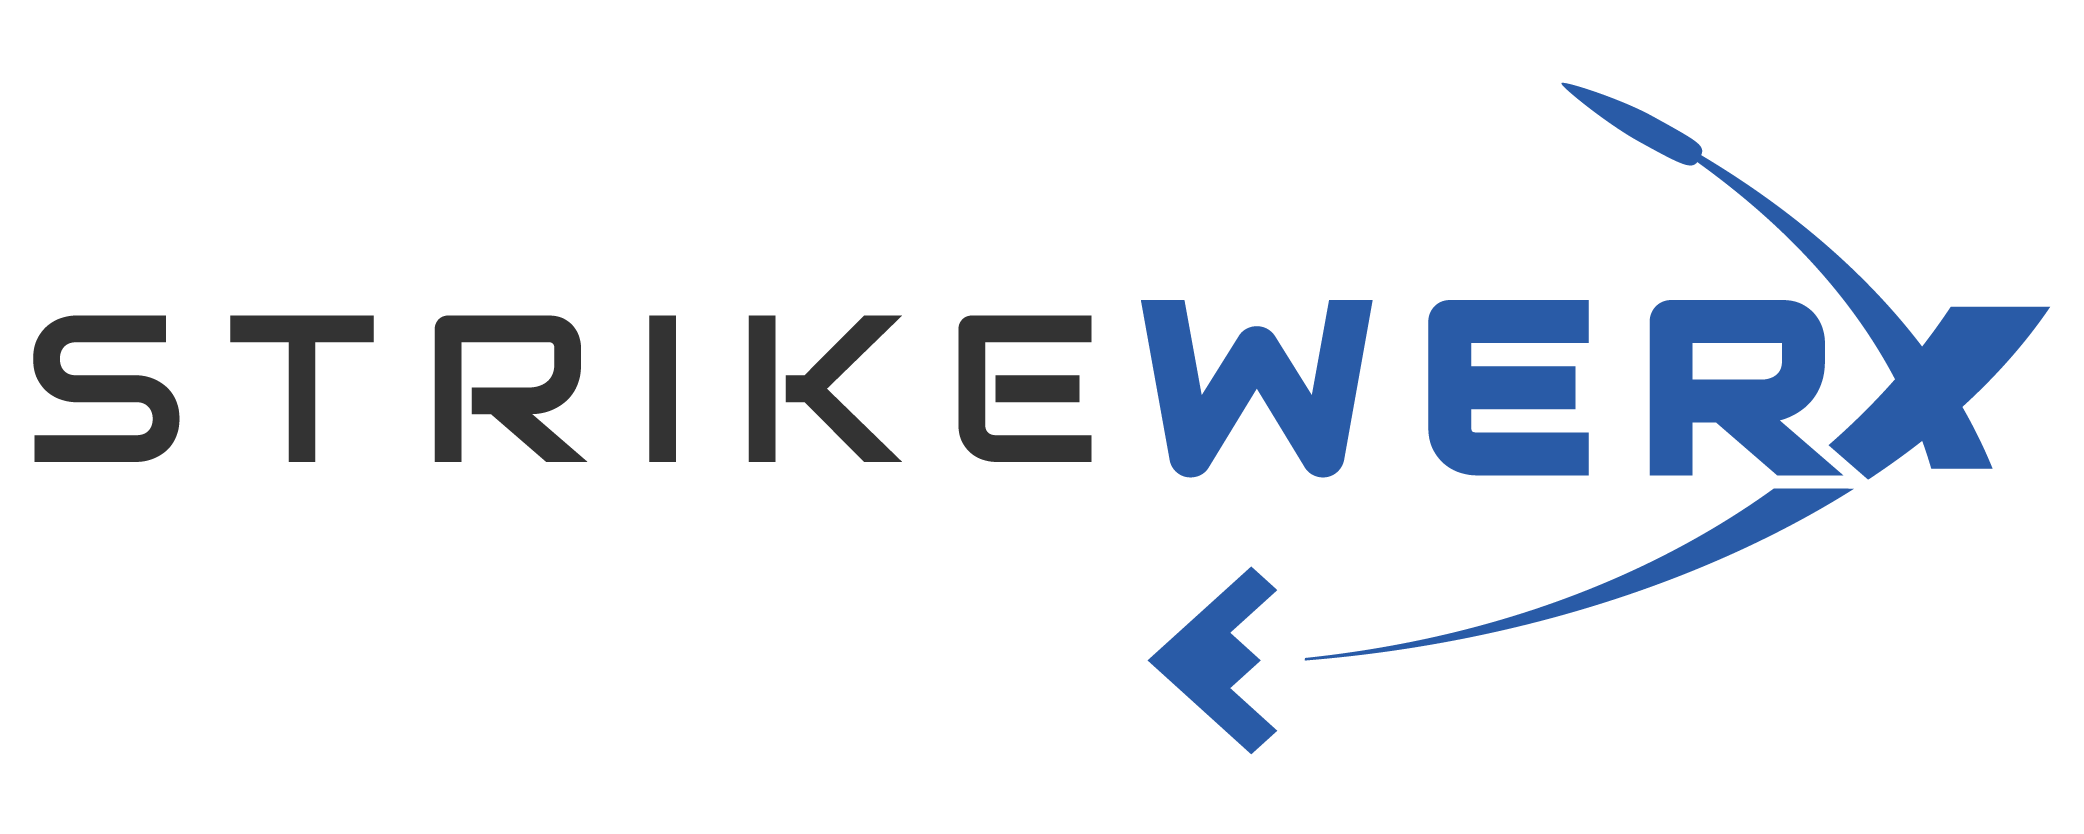 strikewerx logo